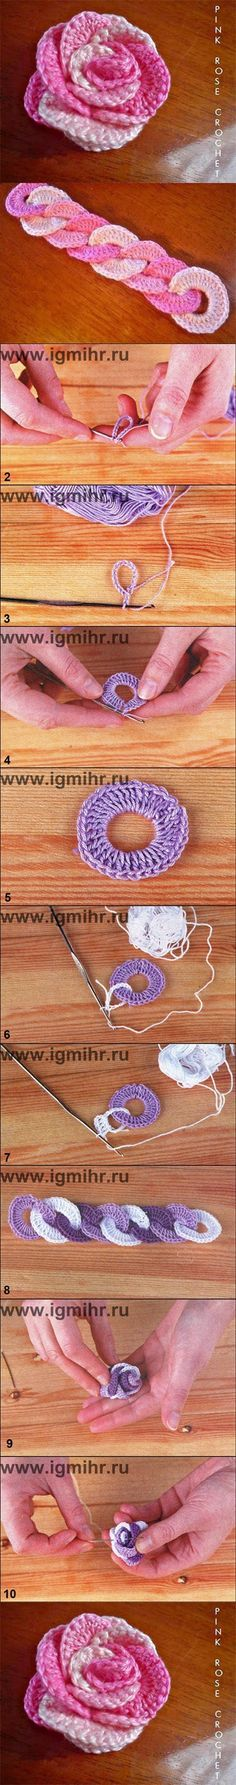 how to DIY Crochet Interlocking Rose, hairband, belt | www.FabArtDIY.com LIKE Us on Facebook ==> https://www.facebook.com/FabArtDIY